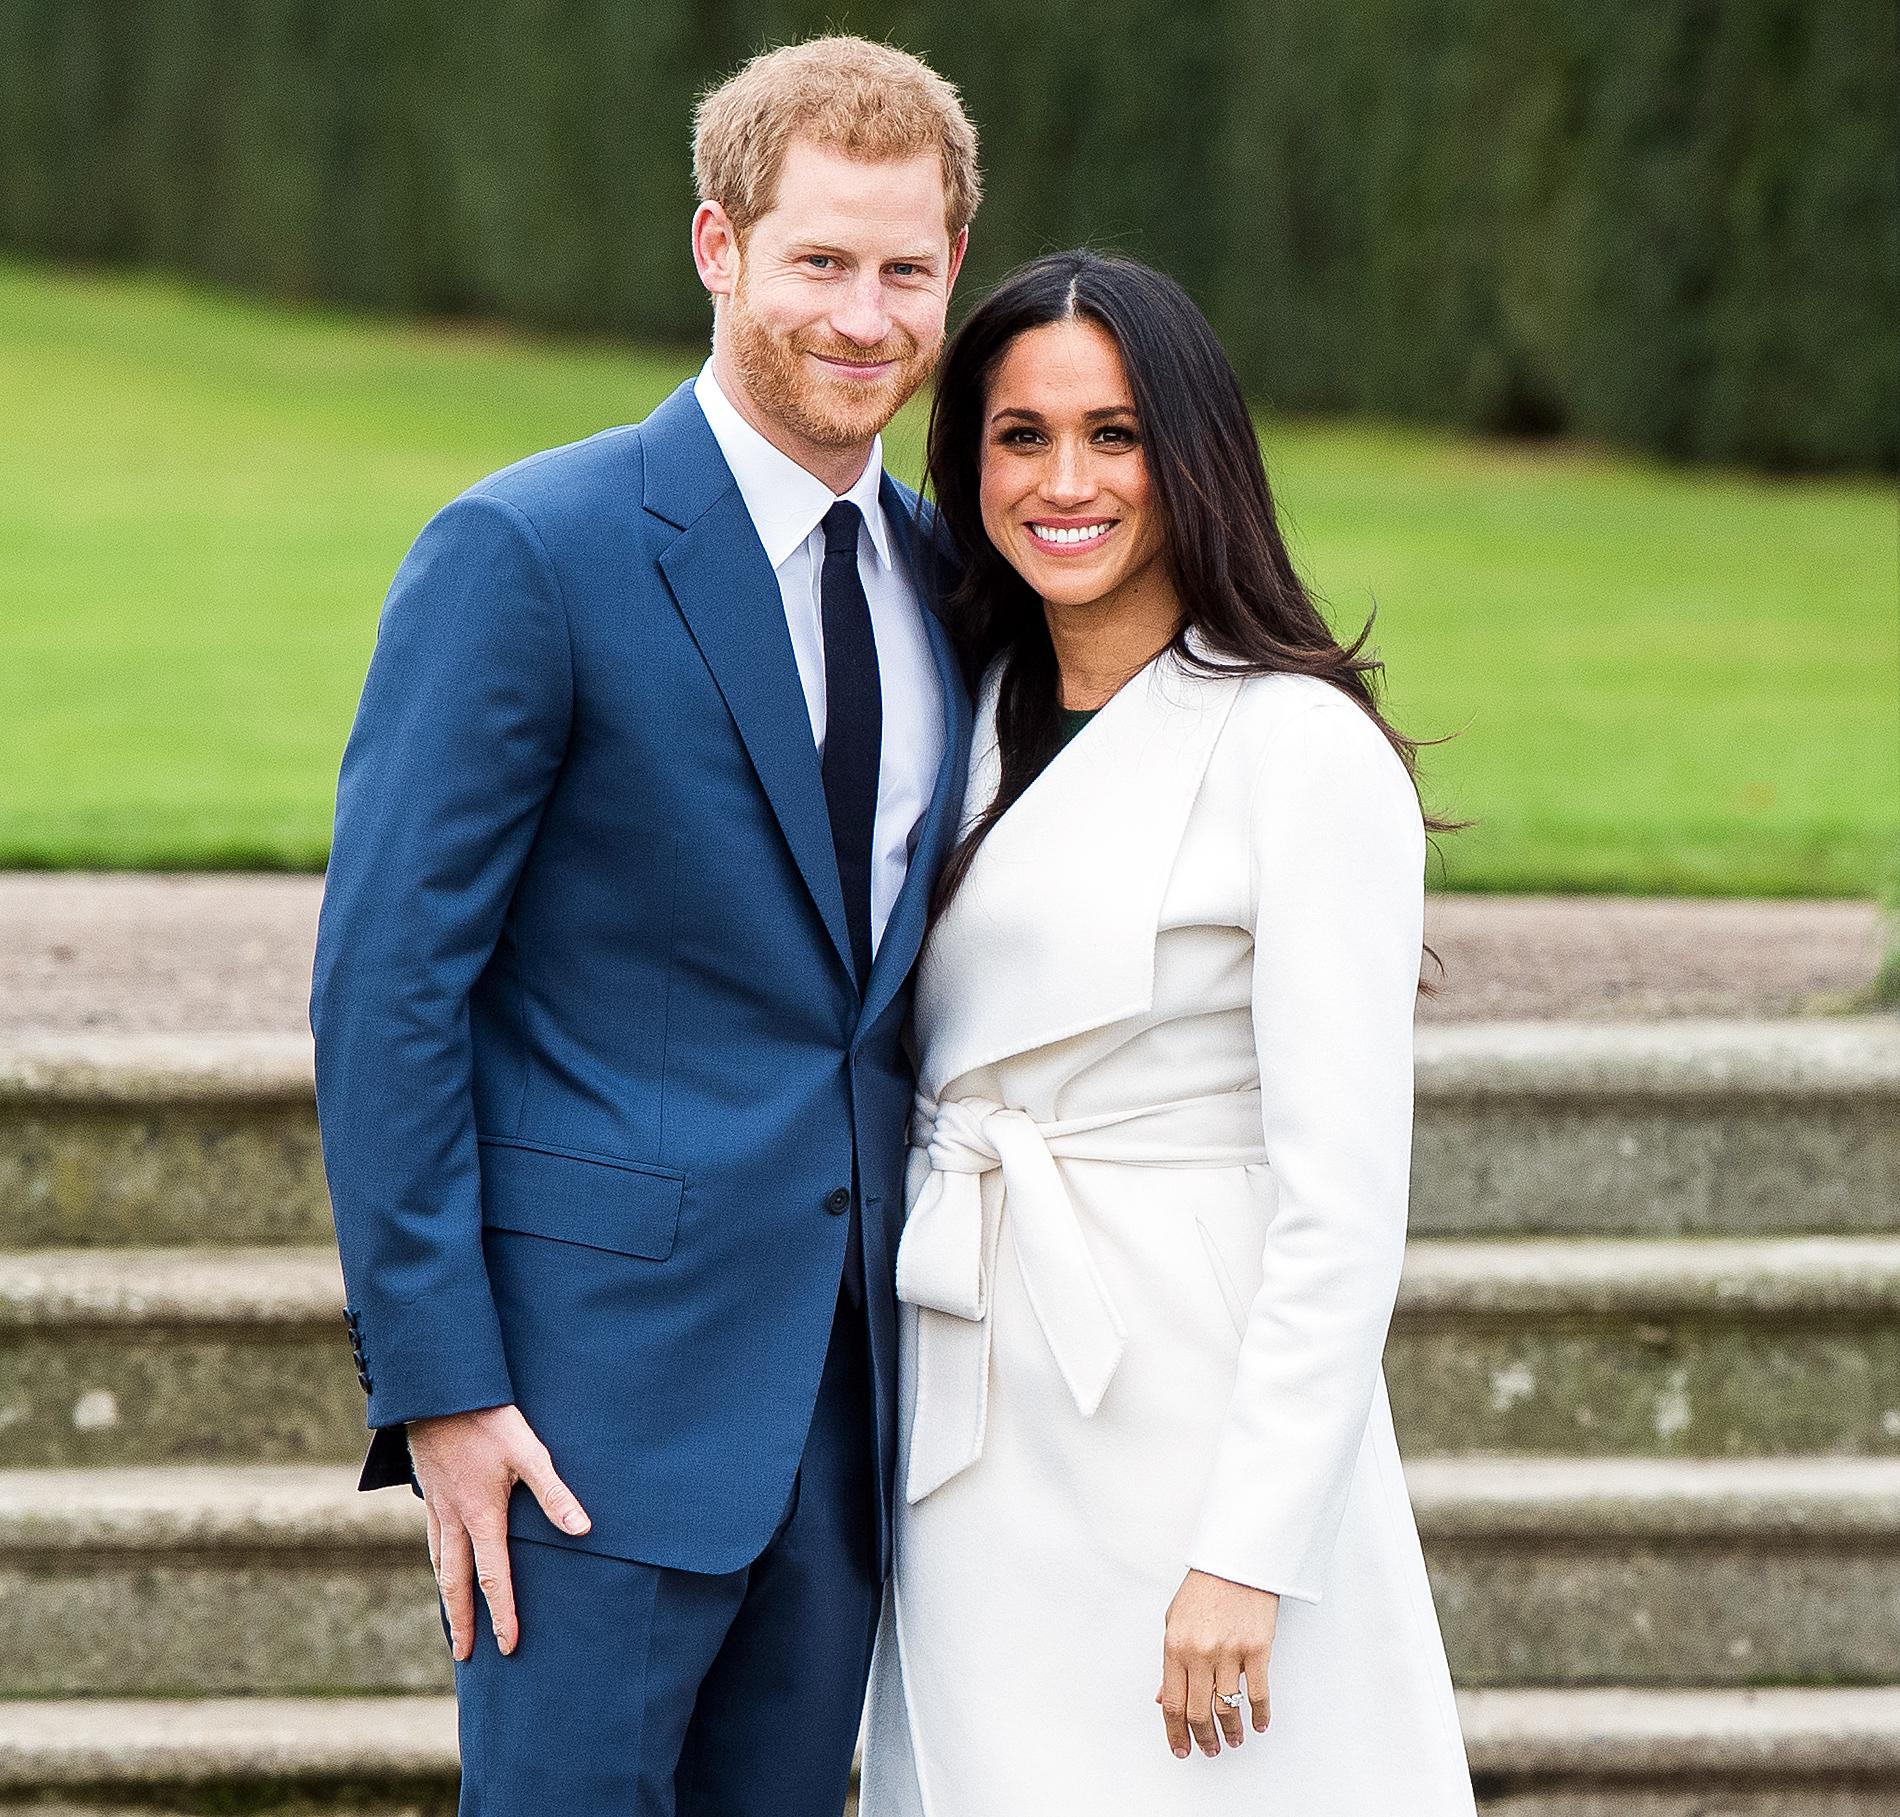 NBC hosts broadcast Royal Wedding